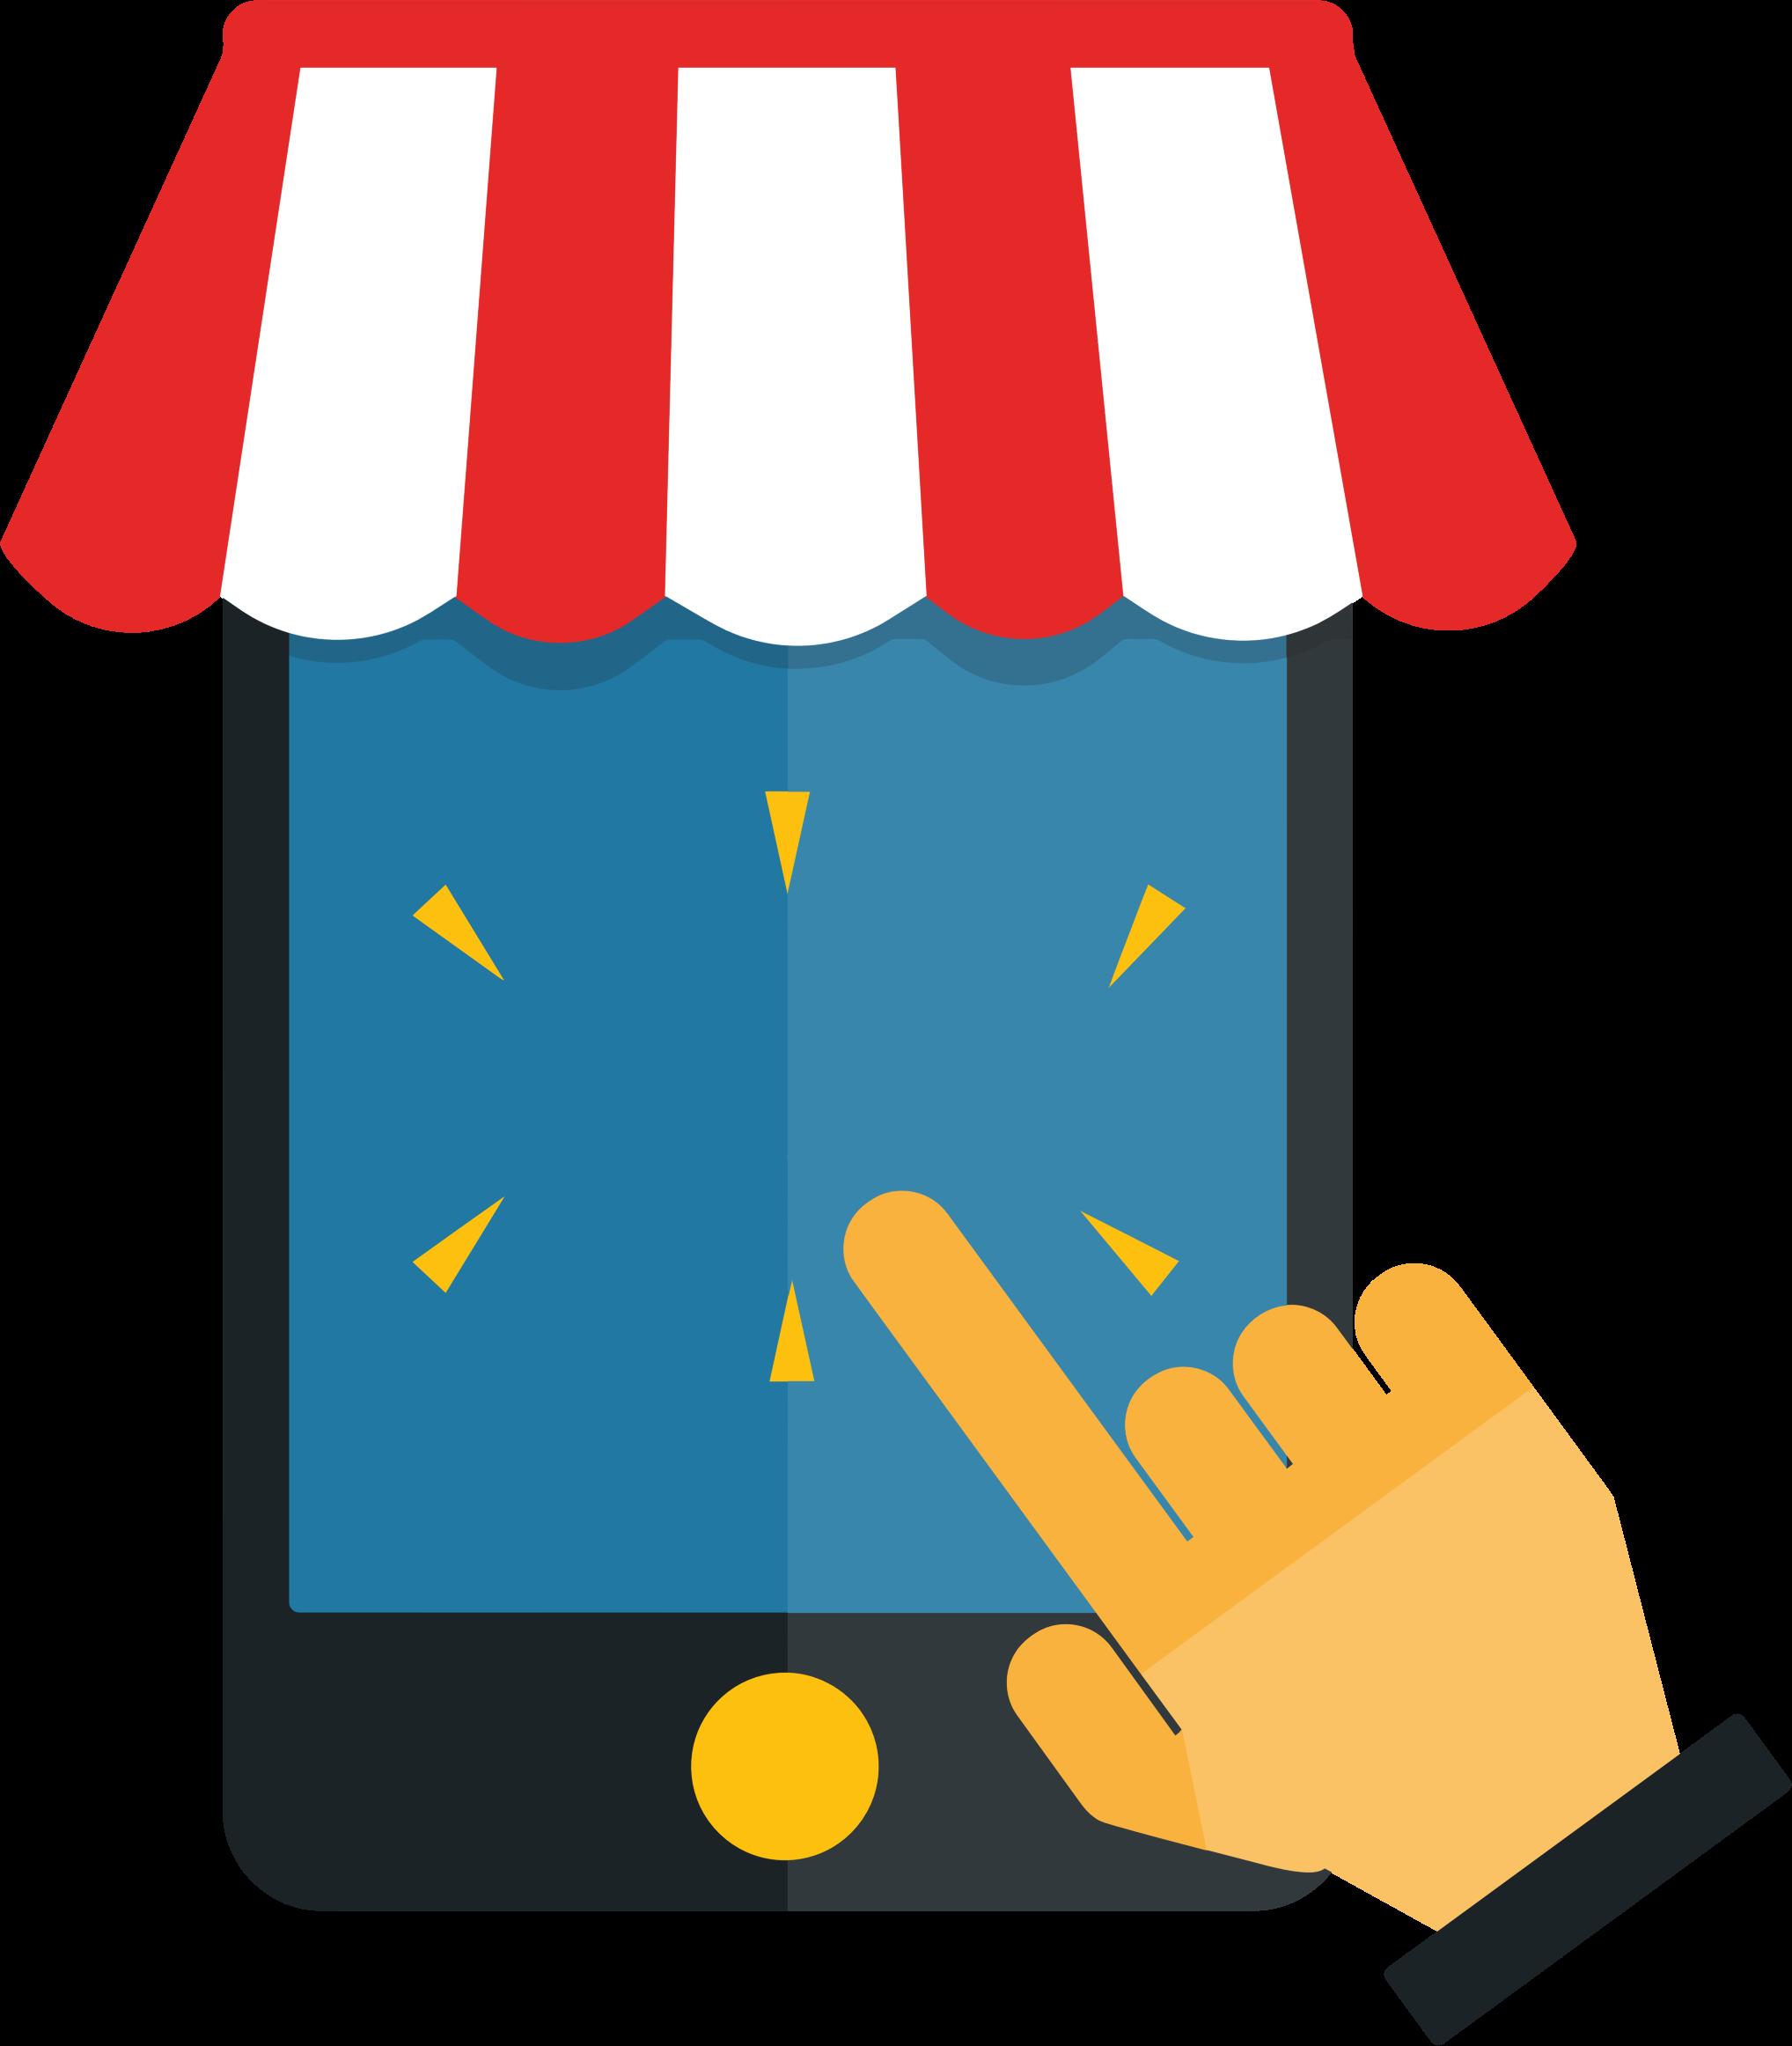 Shop clipart mobile shop. Shopping no text big